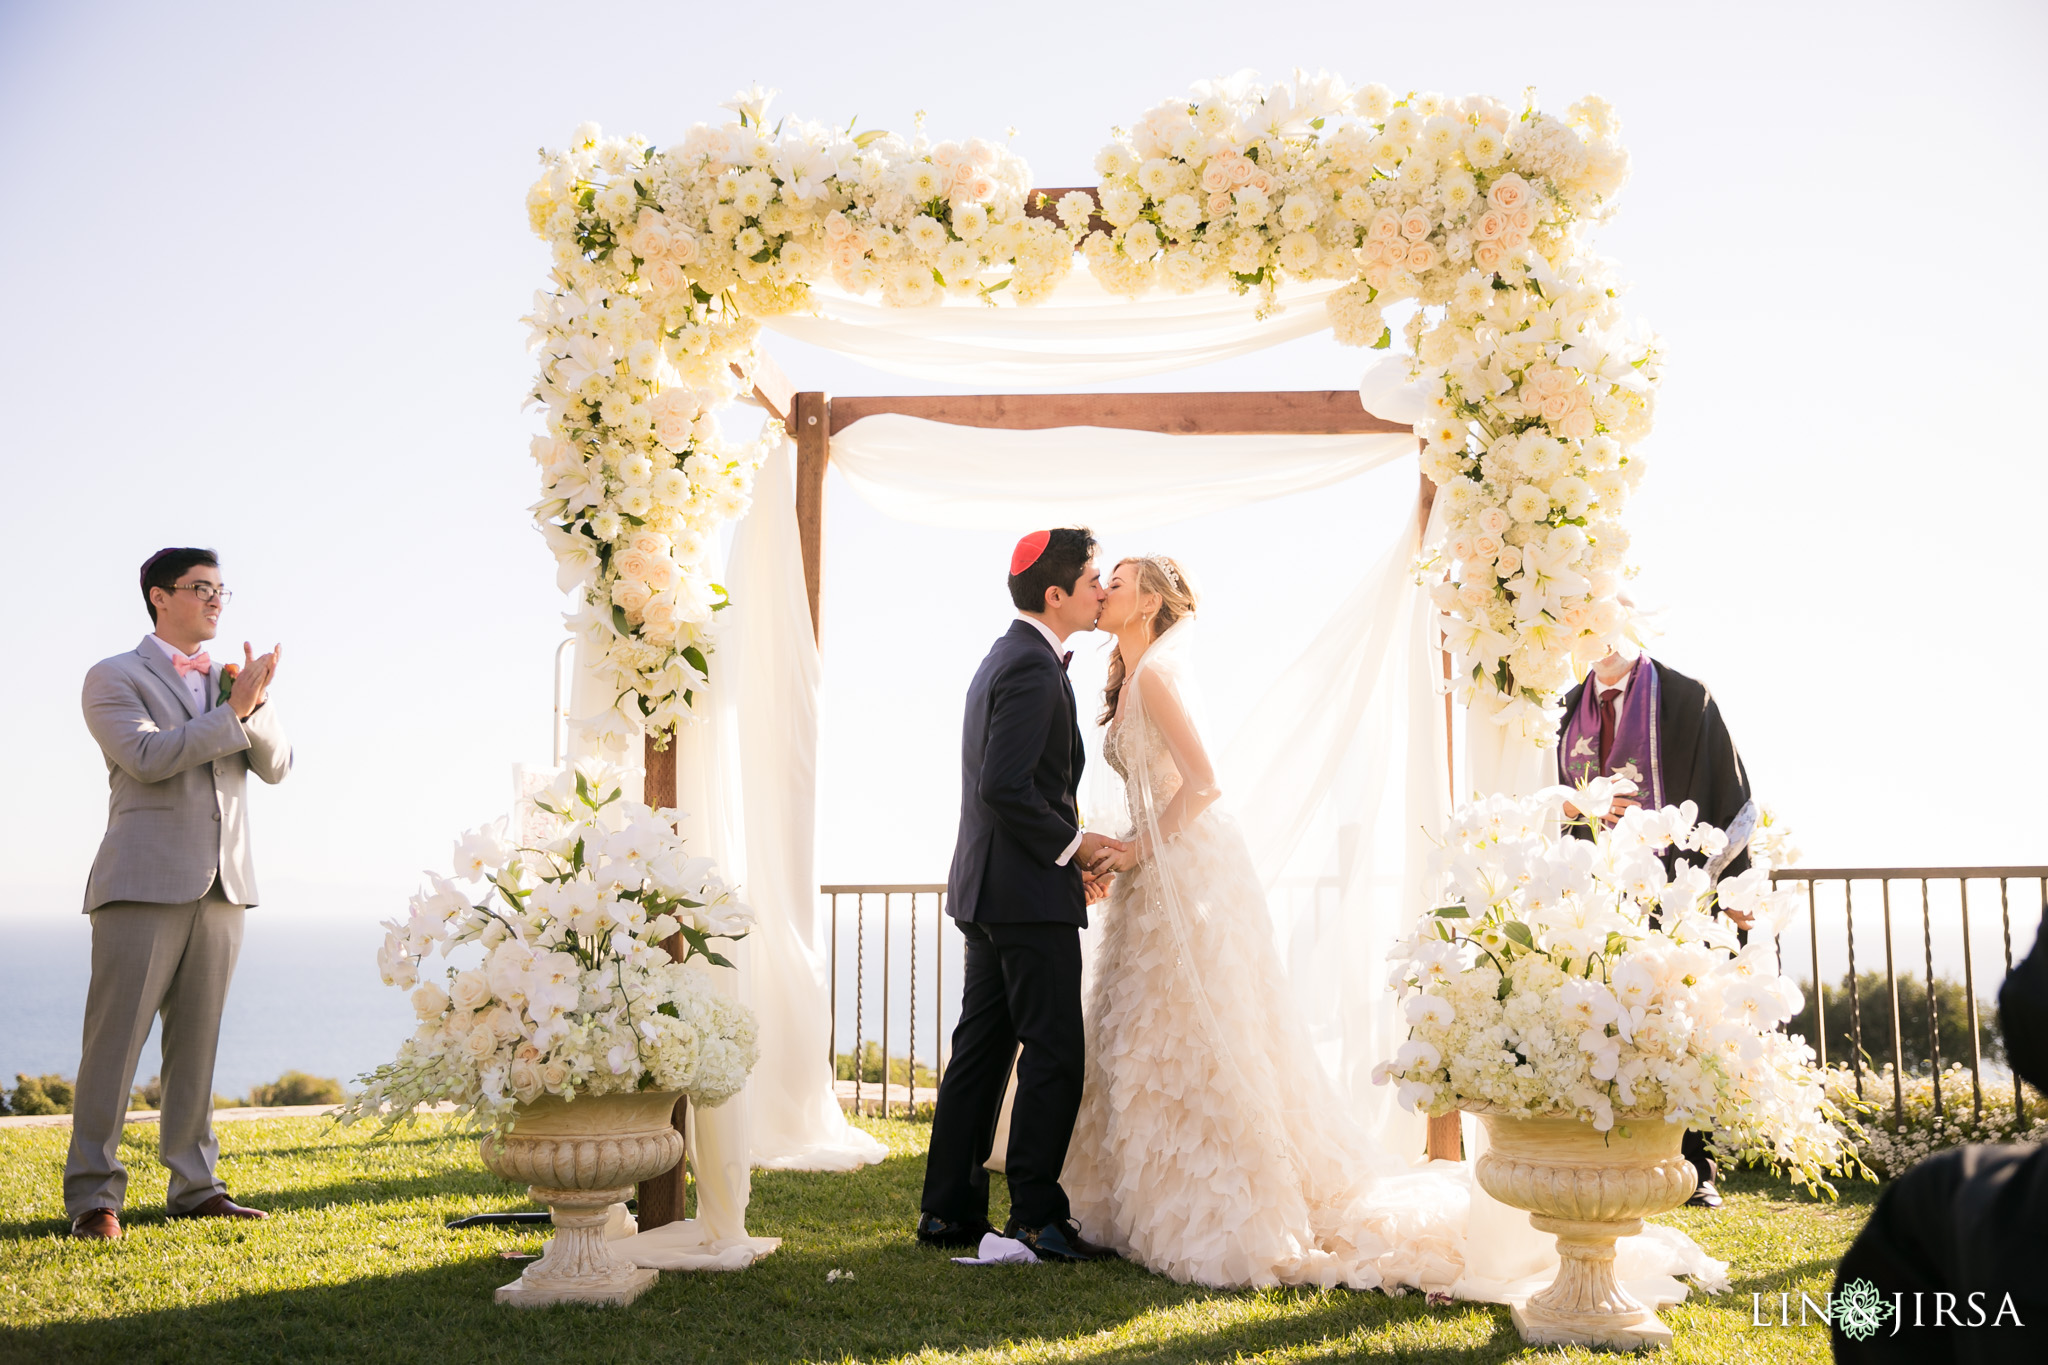 chuppah-in-Jewish-Weddings-trump-national-golf-course-jewish-wedding-photography